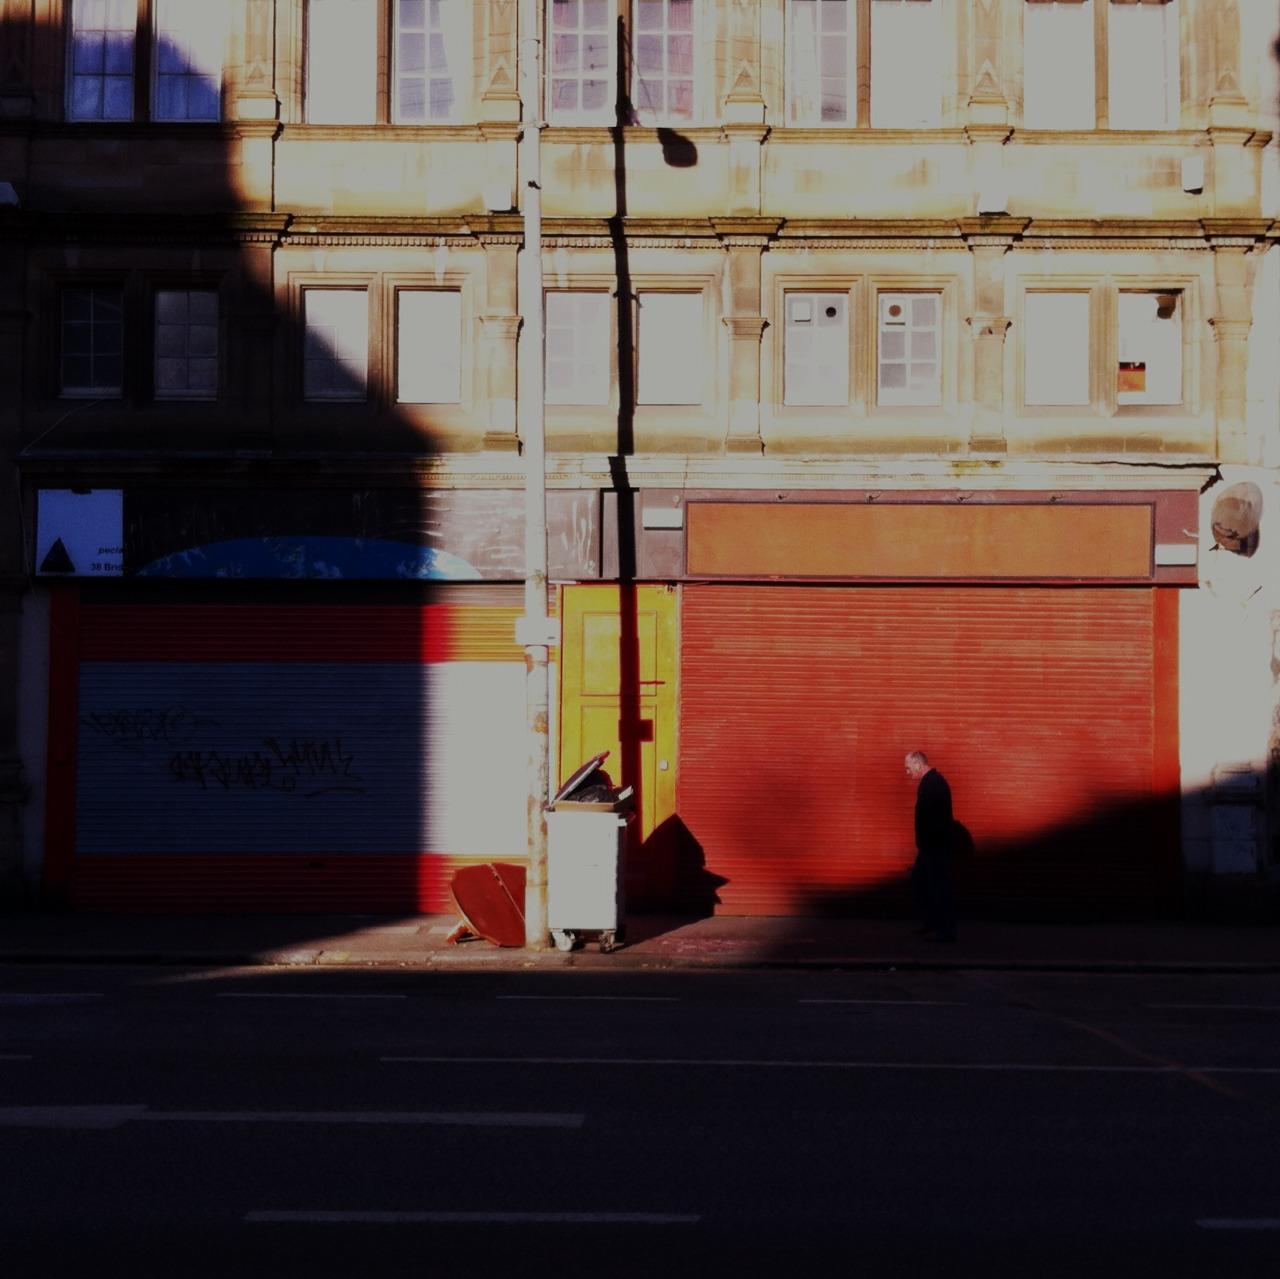 Bridge Street, Glasgow